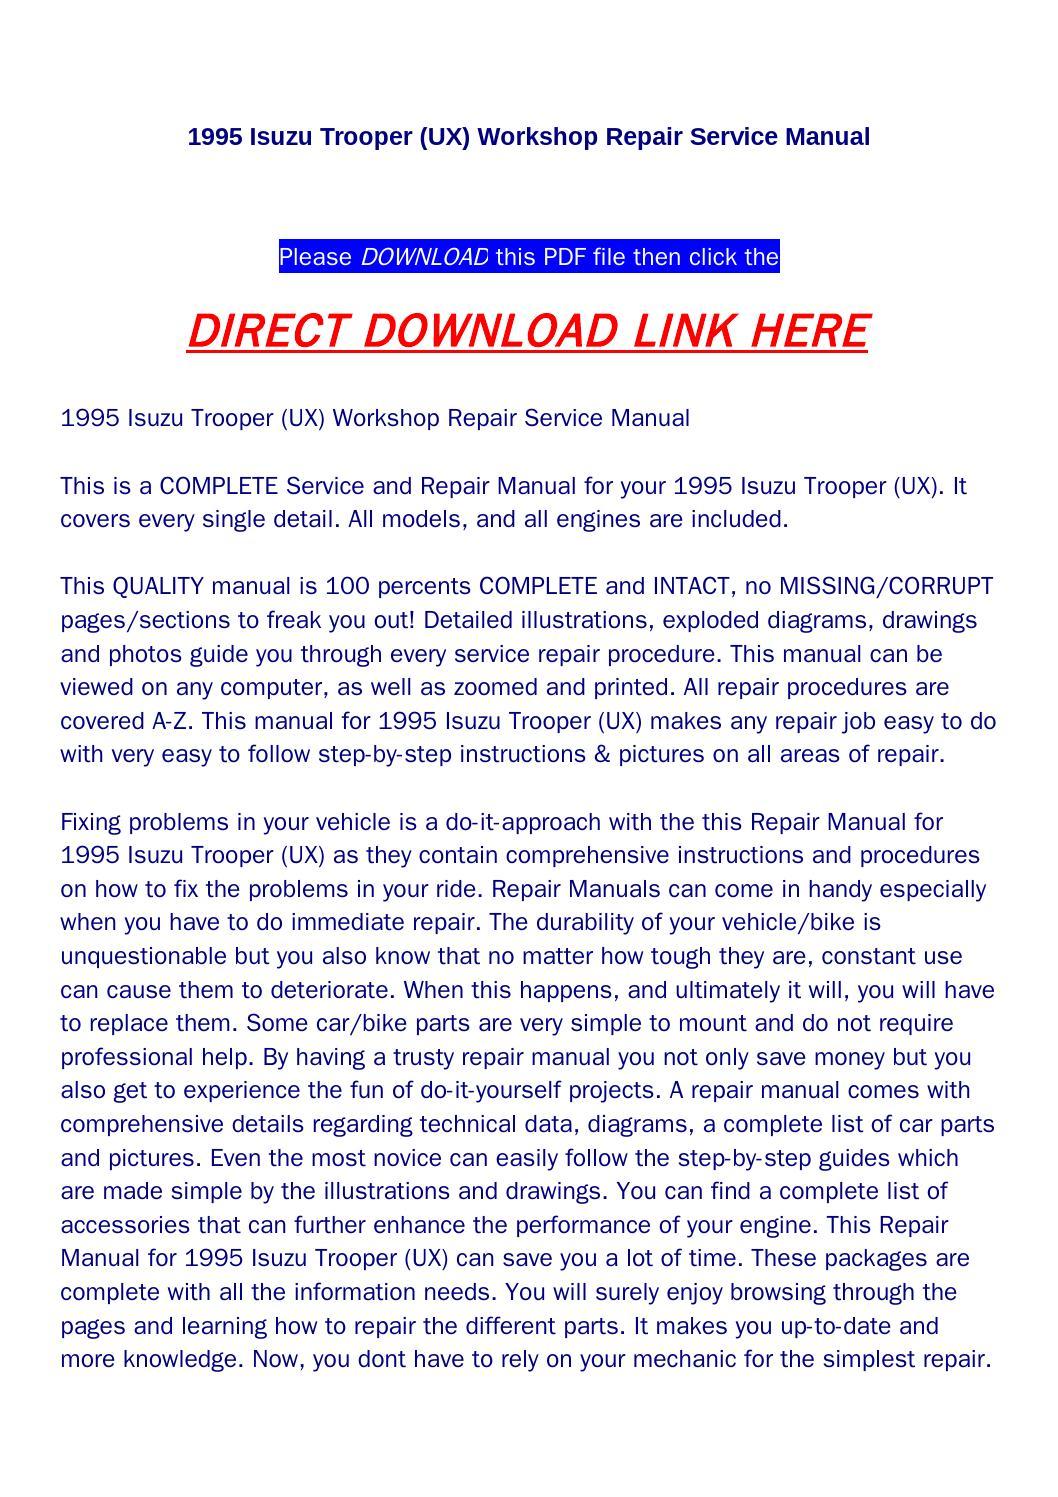 Isuzu trooper 1995 Manual pdf